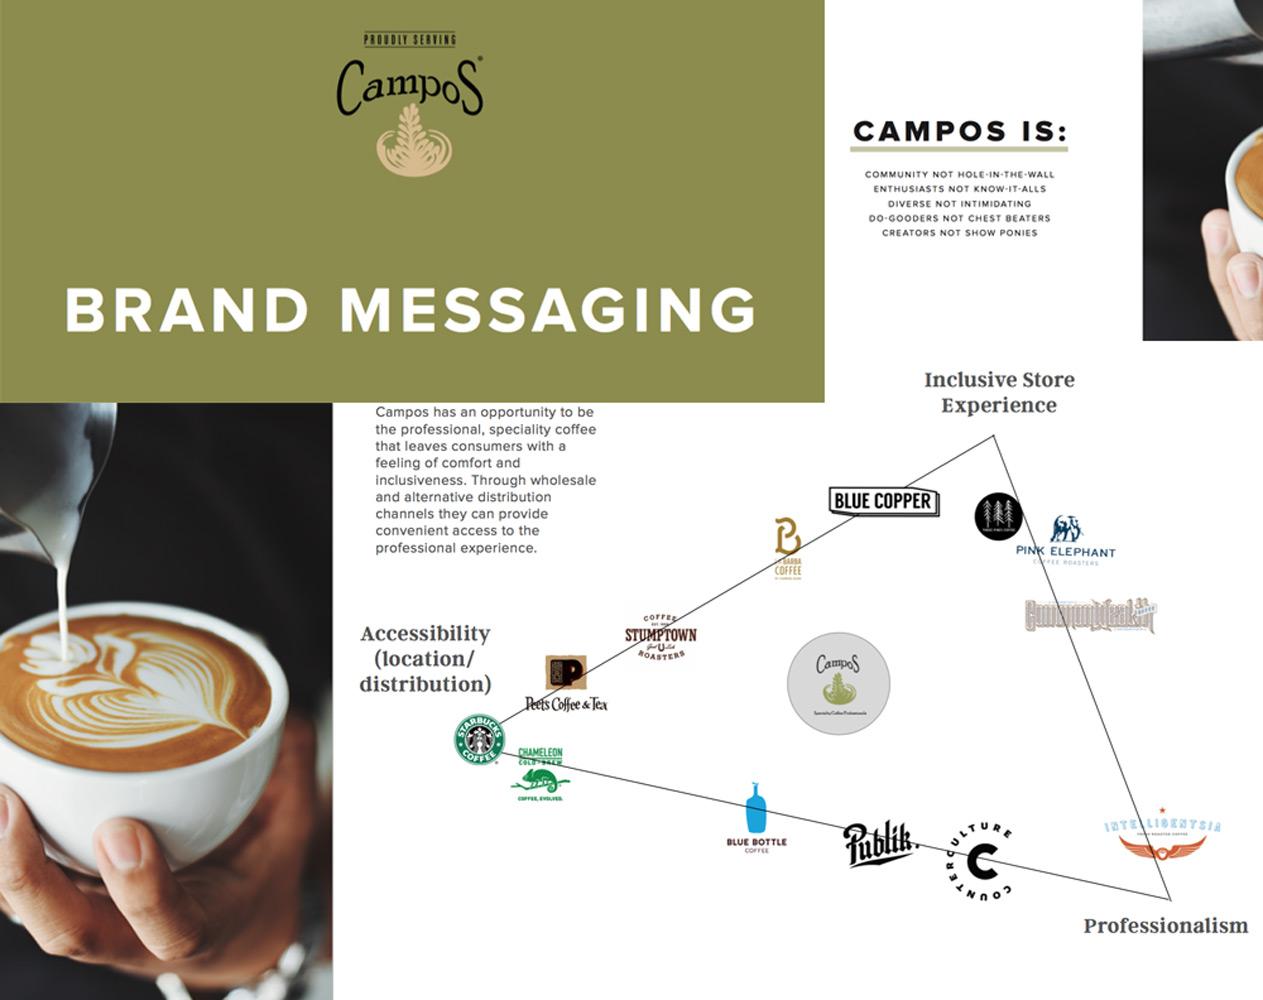 BrandMessaging_Campos1.jpg